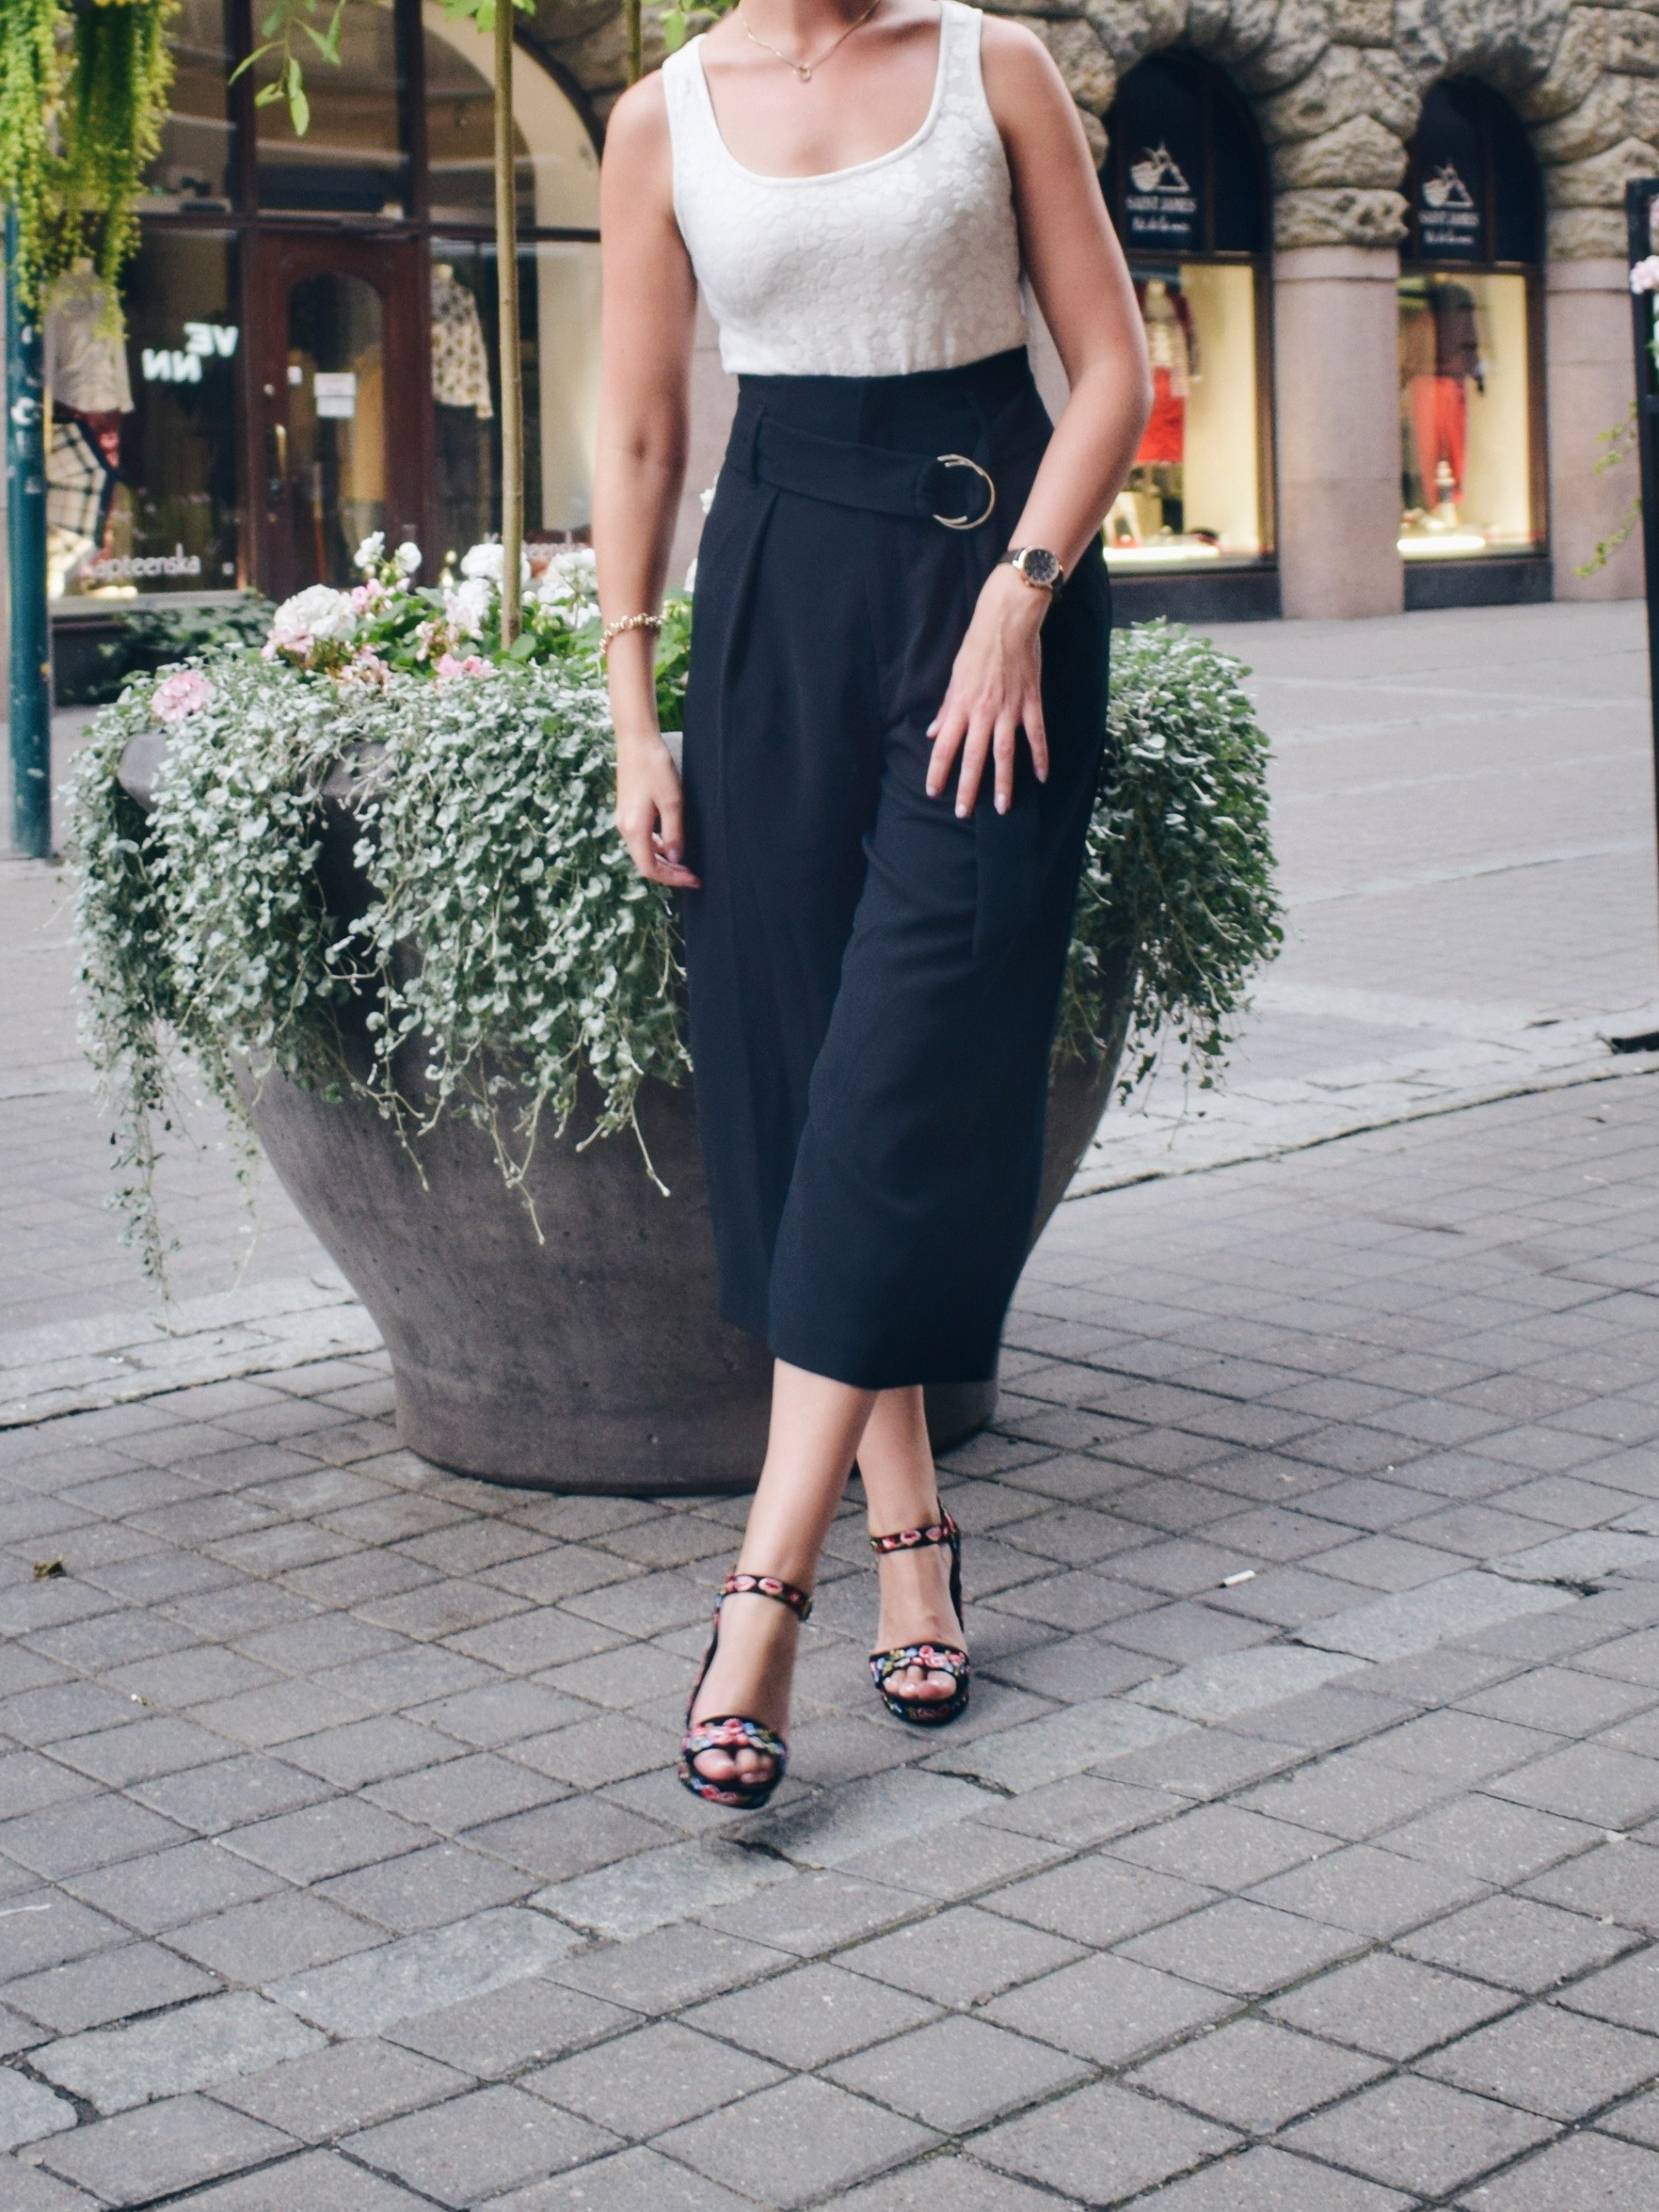 Outlandish blog values life outfit celebration style fashion culottes